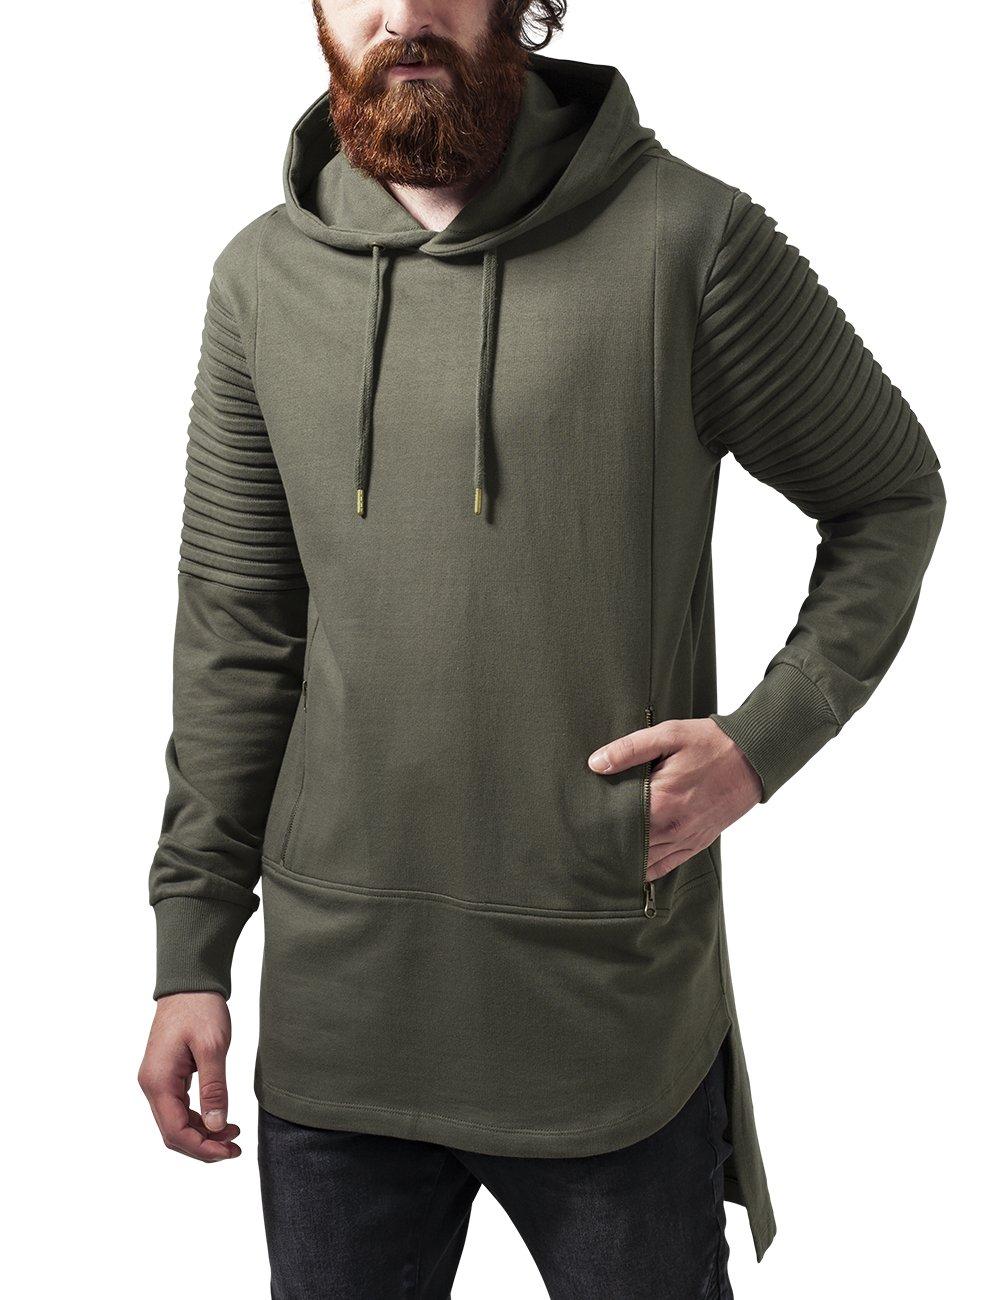 Urban Classic Men's Pleat Sleeves Terry Hilo Sports Hoodie: Amazon.co.uk:  Clothing